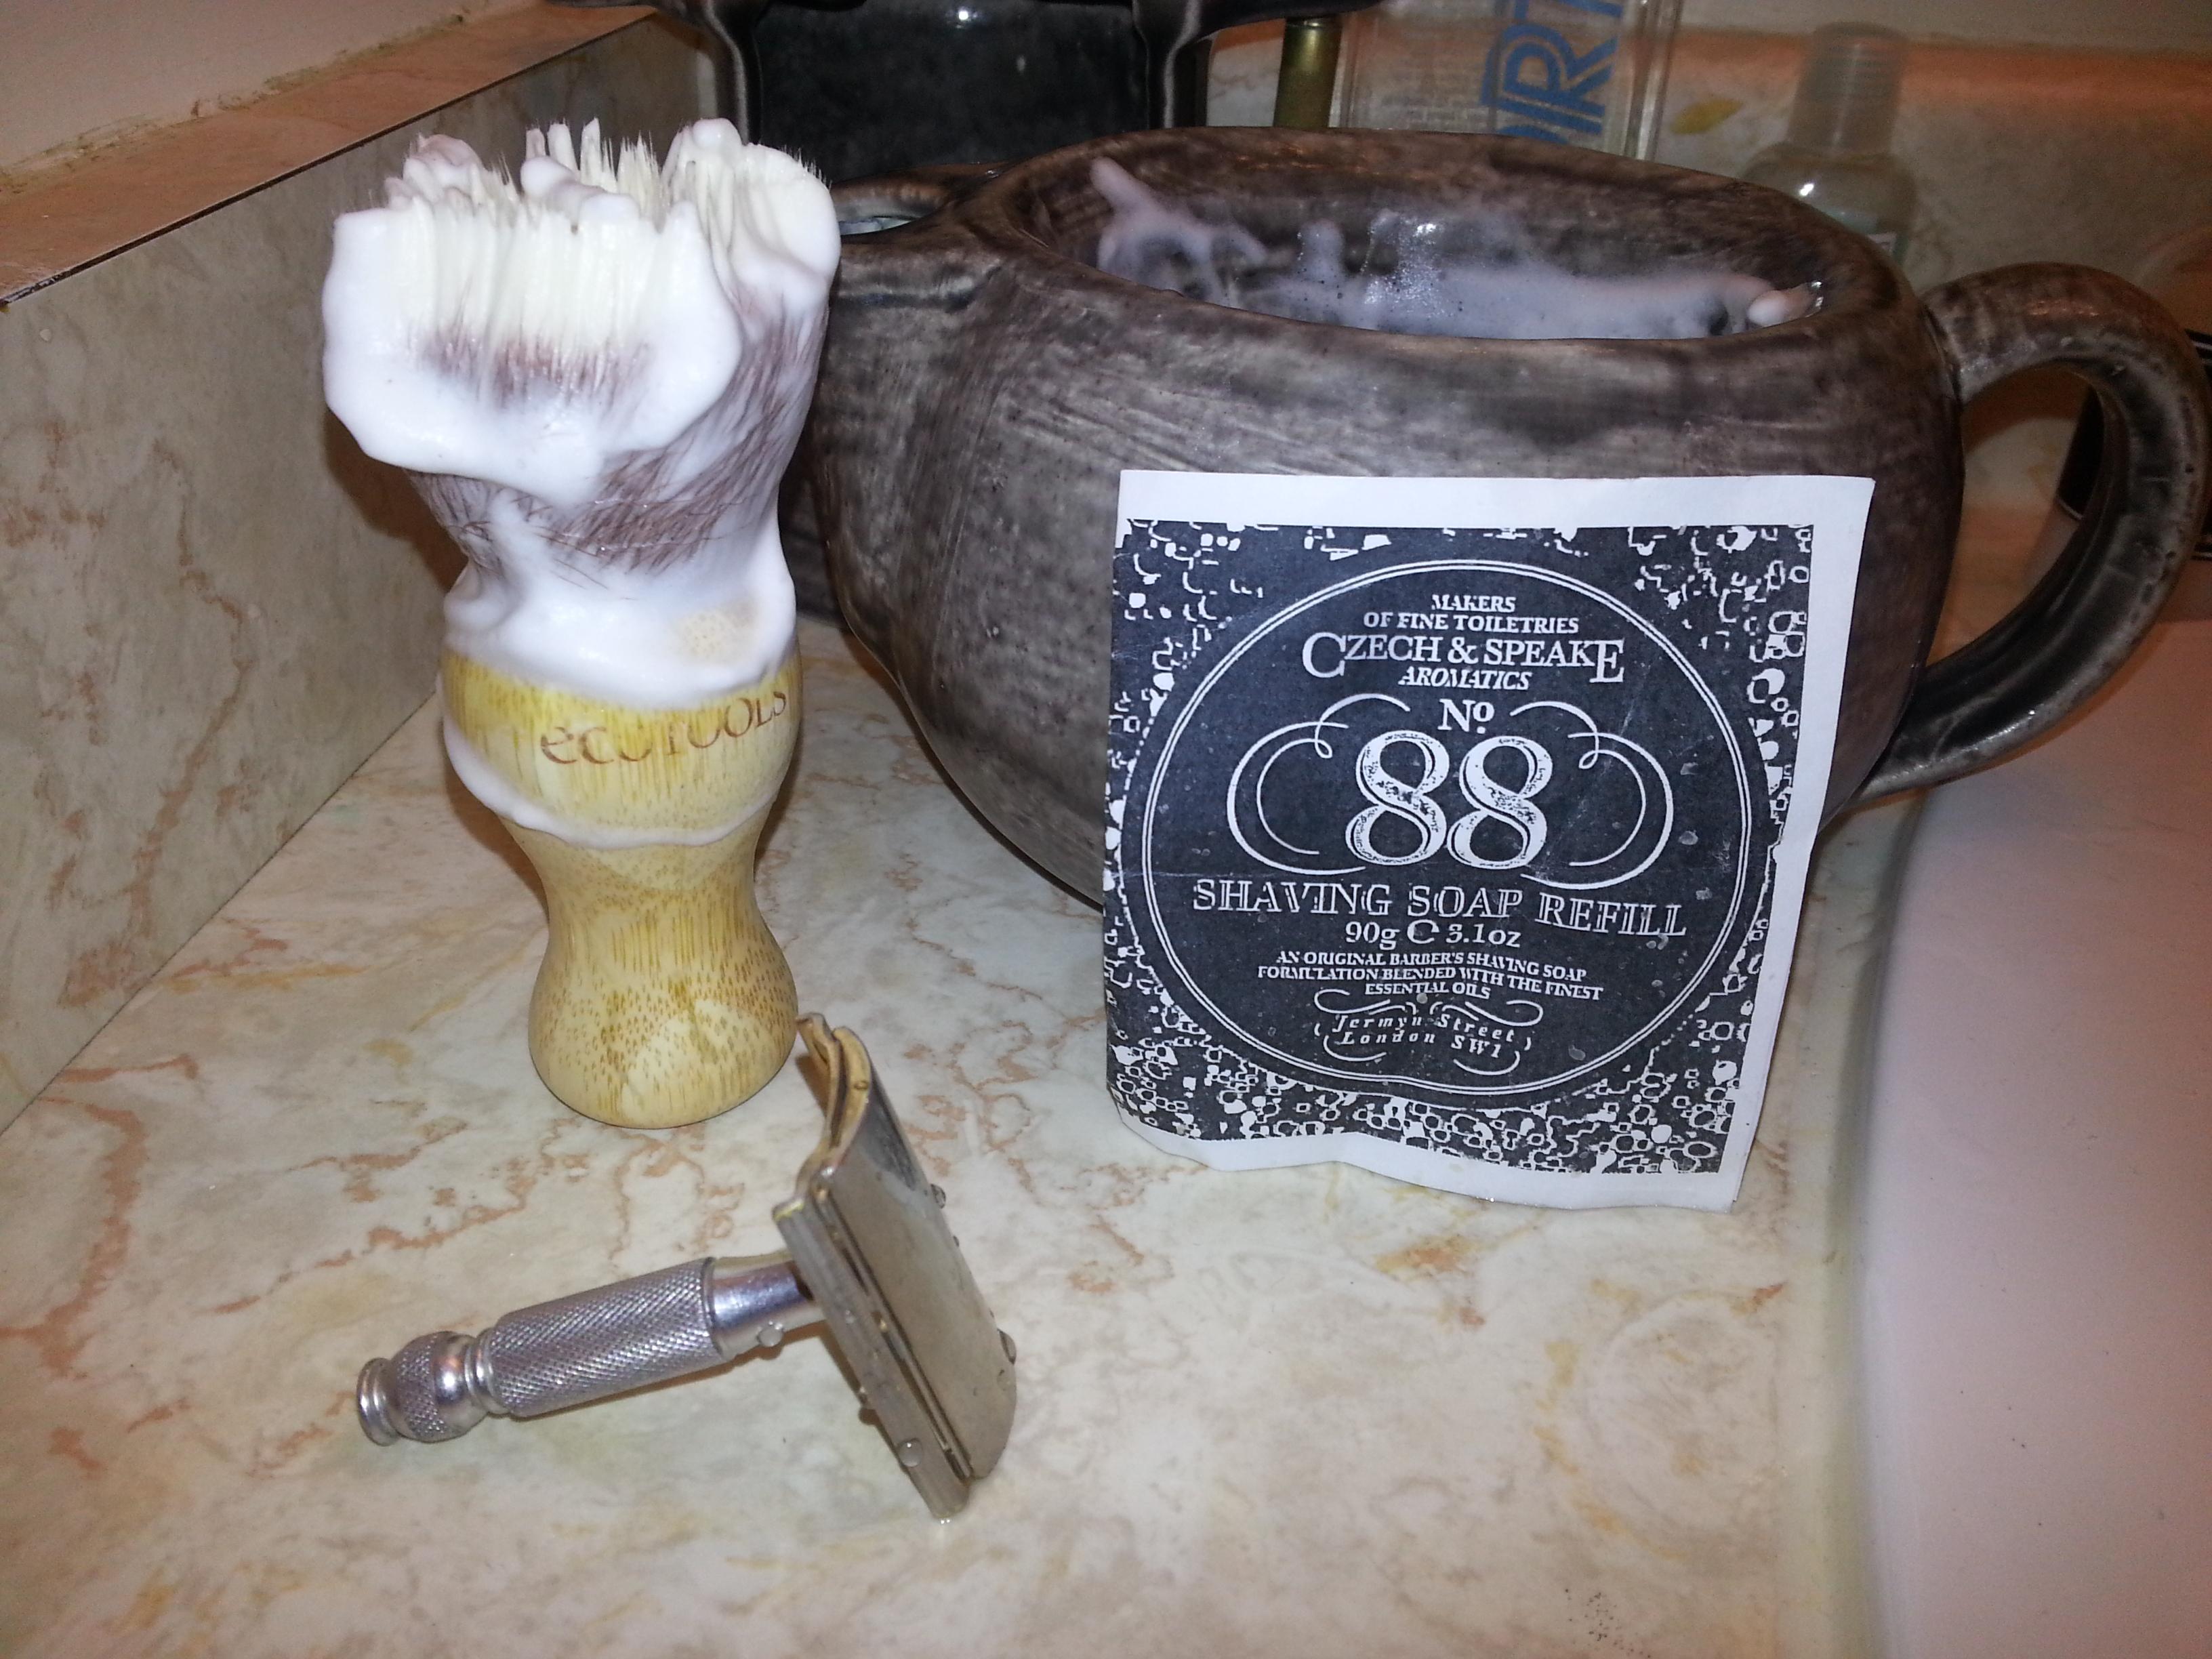 Czech and Speake – no. 88 shaving soap | Palpz's Shaving Soap Reviews